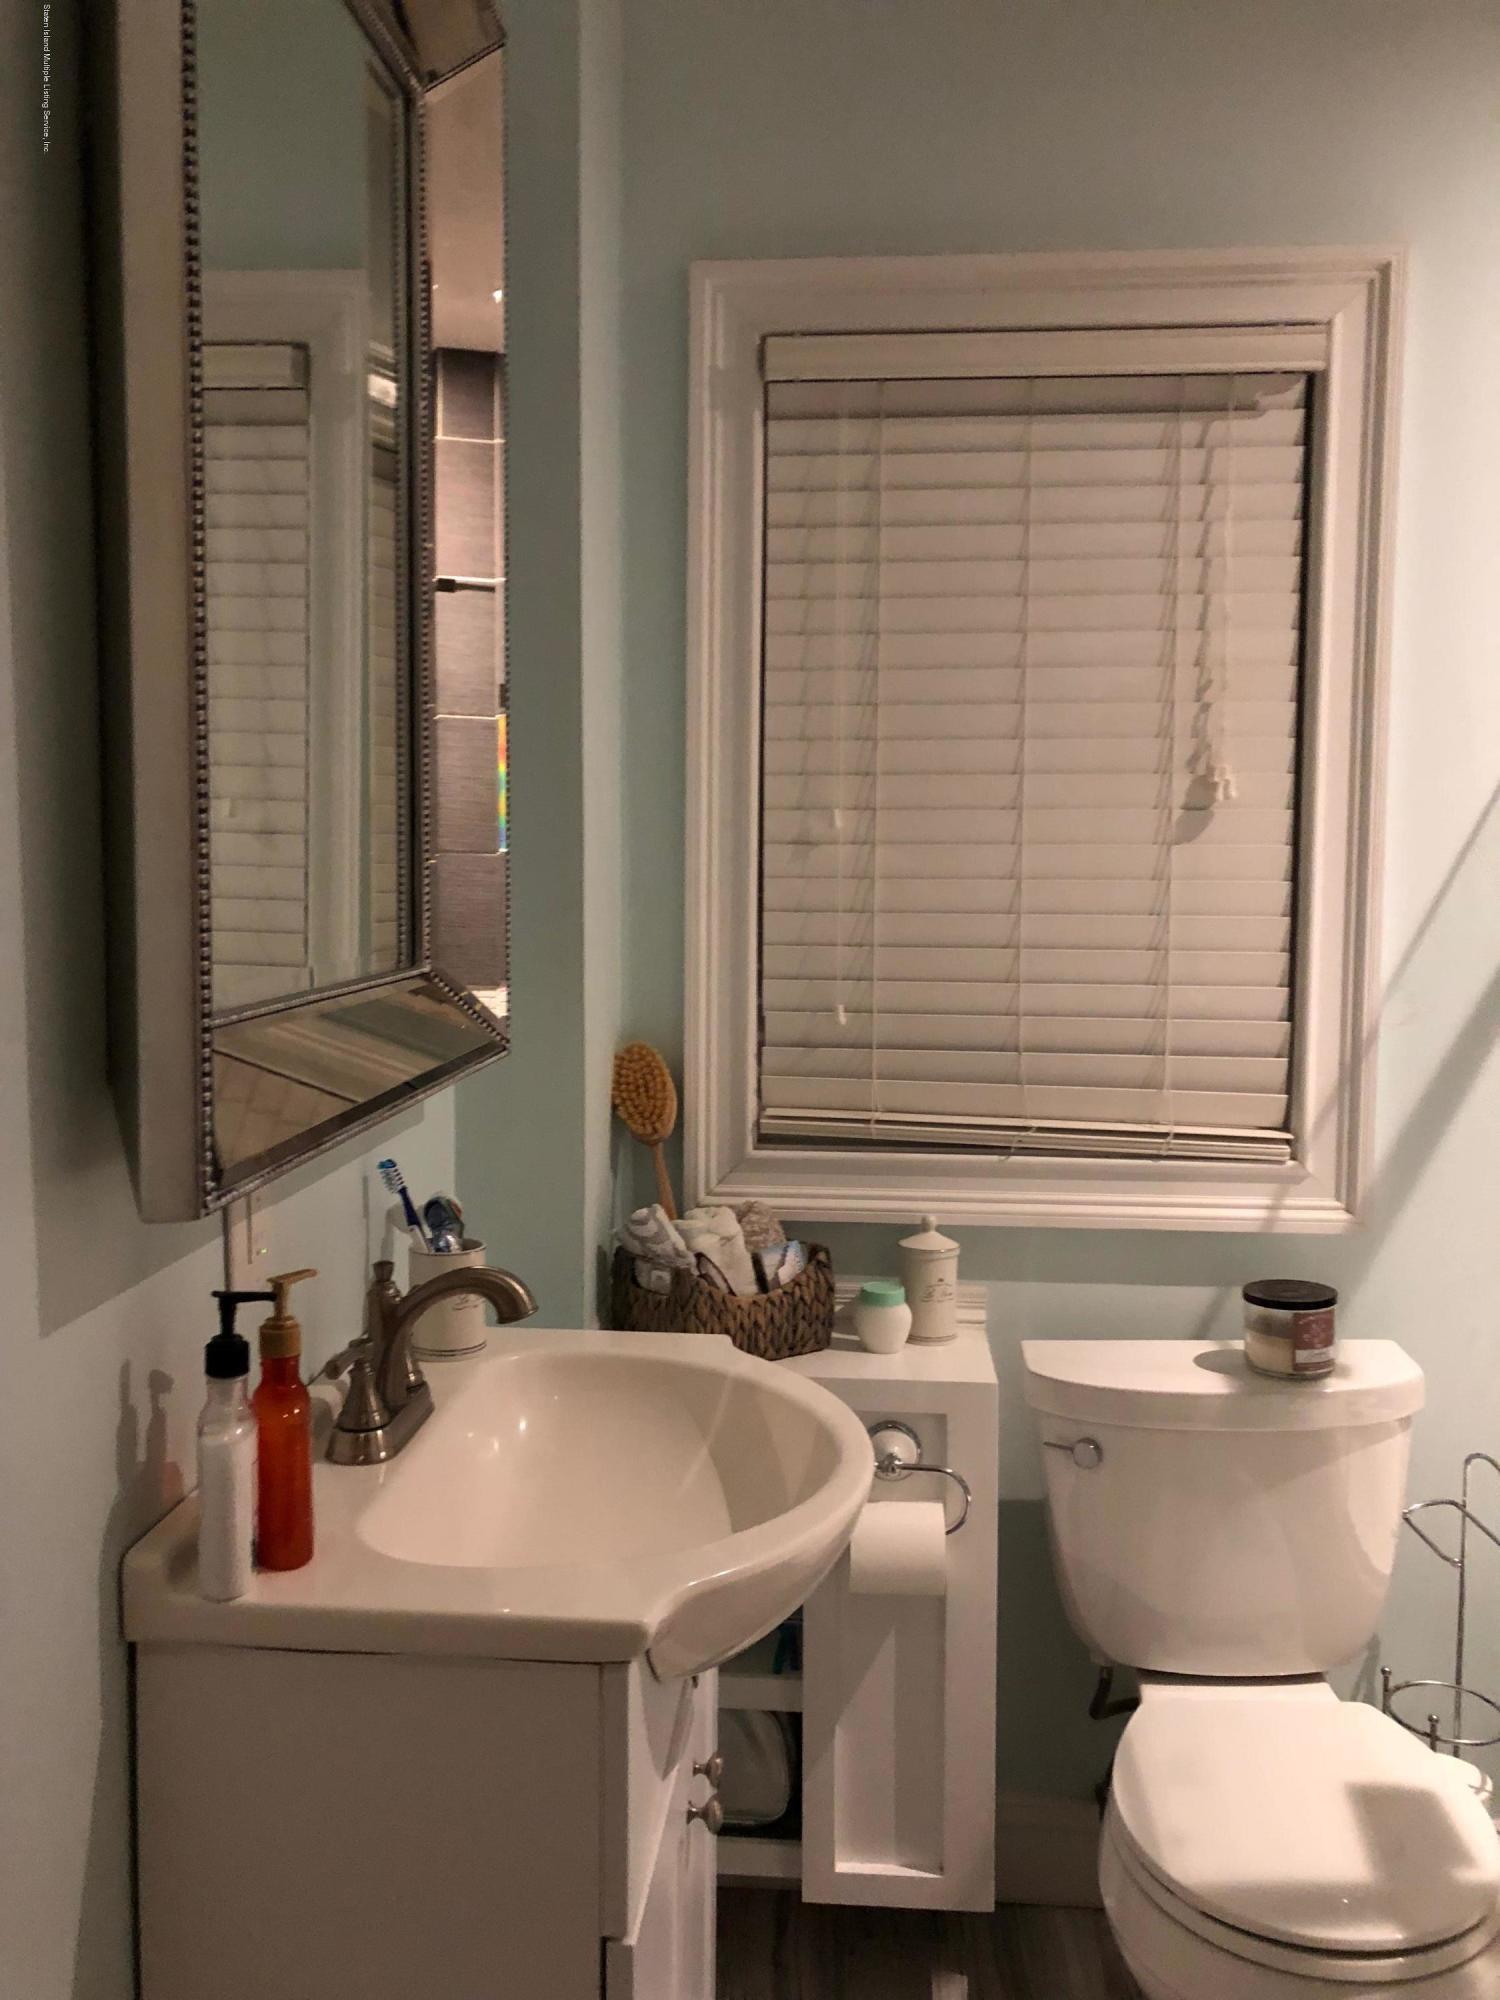 122 Kingsley Avenue,Staten Island,New York,10314,United States,1 Bedroom Bedrooms,5 Rooms Rooms,1 BathroomBathrooms,Res-Rental,Kingsley,1132029